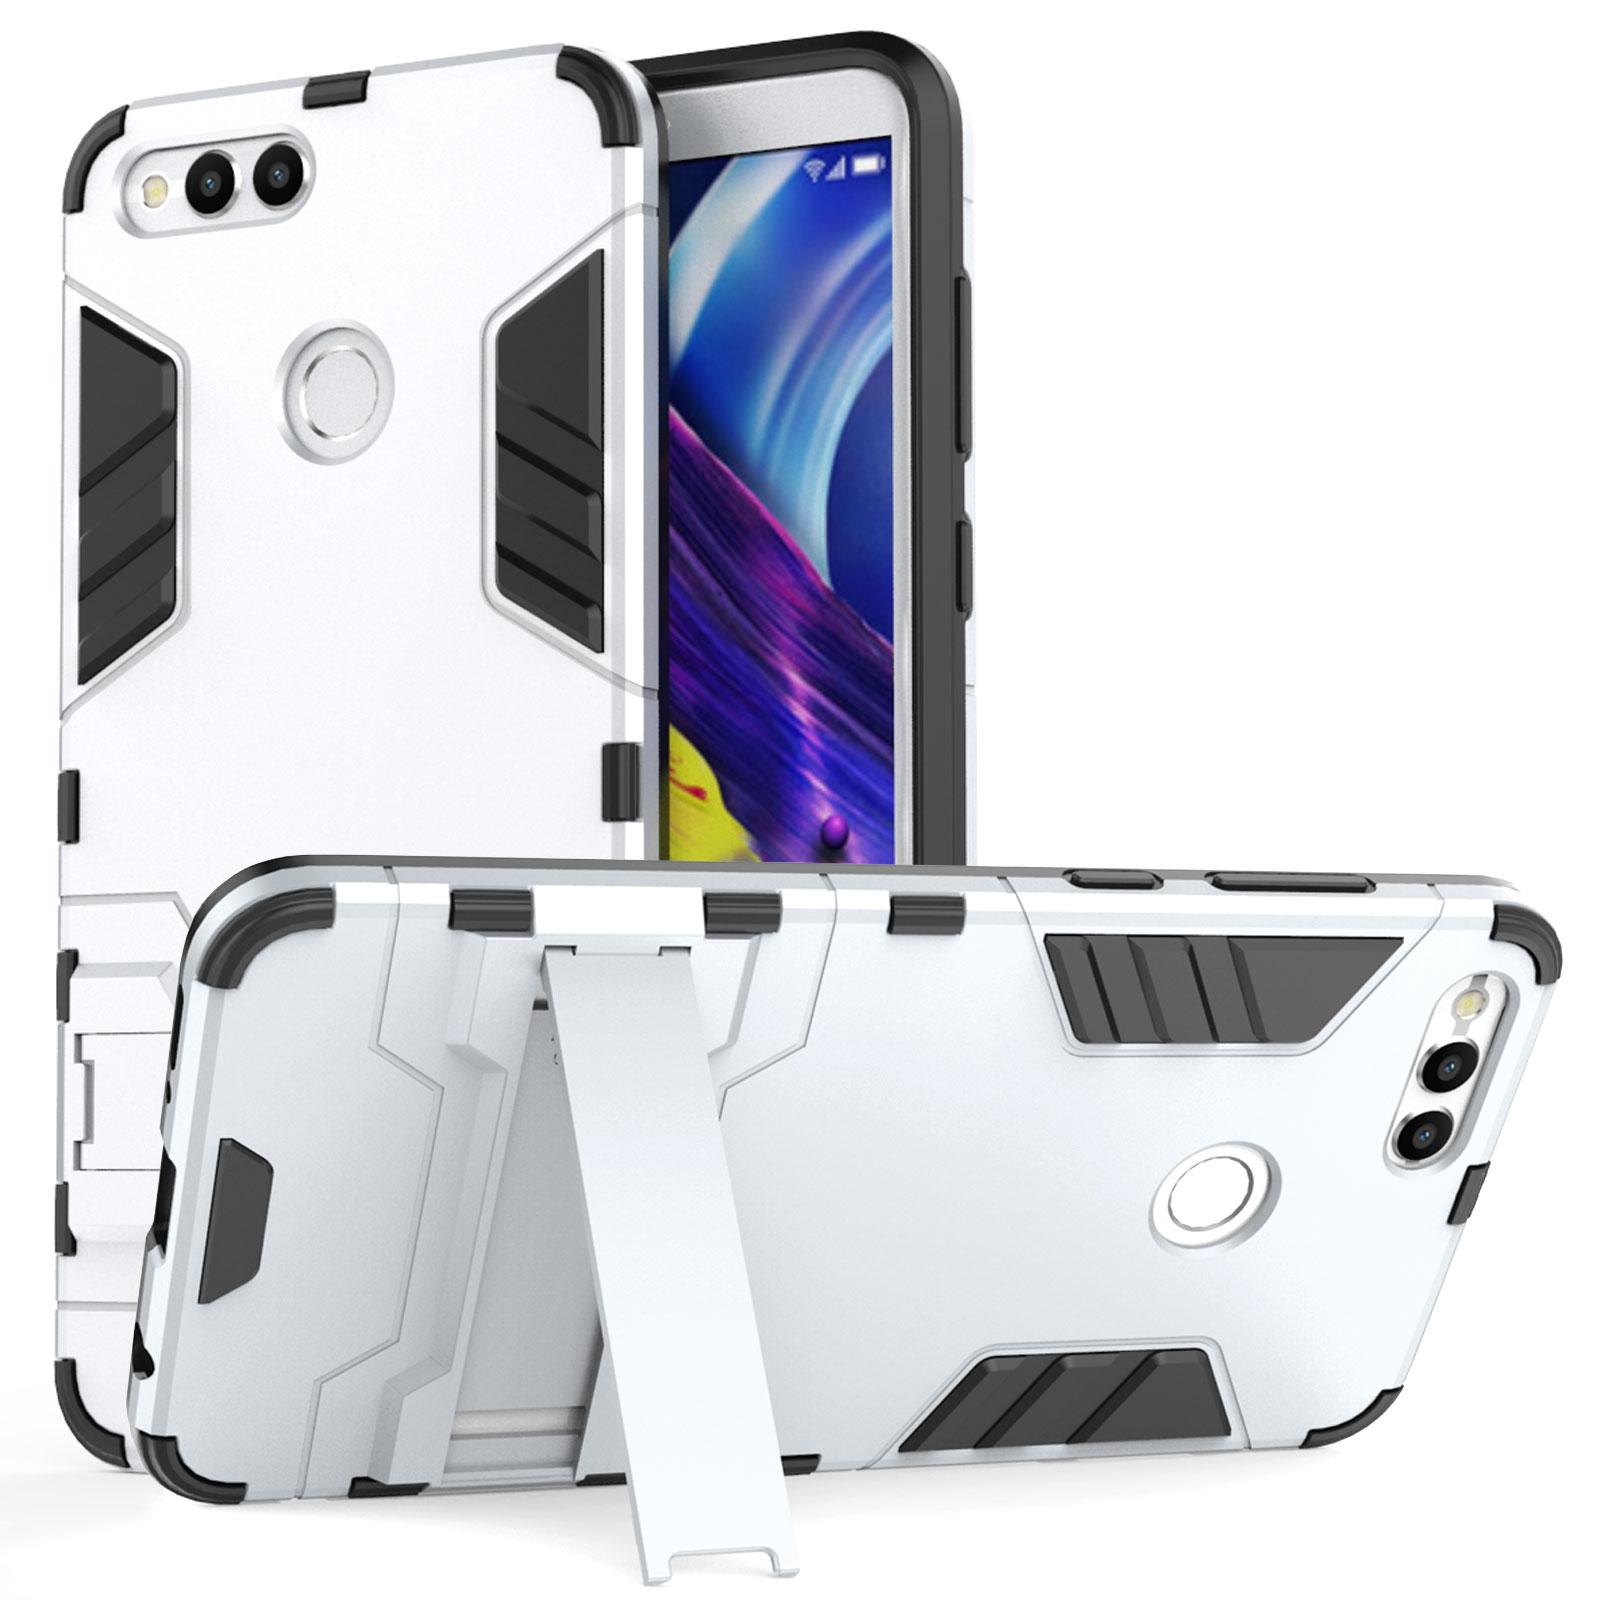 Caseflex Ανθεκτική Dual Layer Θήκη με Stand Honor 7x - Steel Silver & Screen Protector  (HU-AW03-Z529)